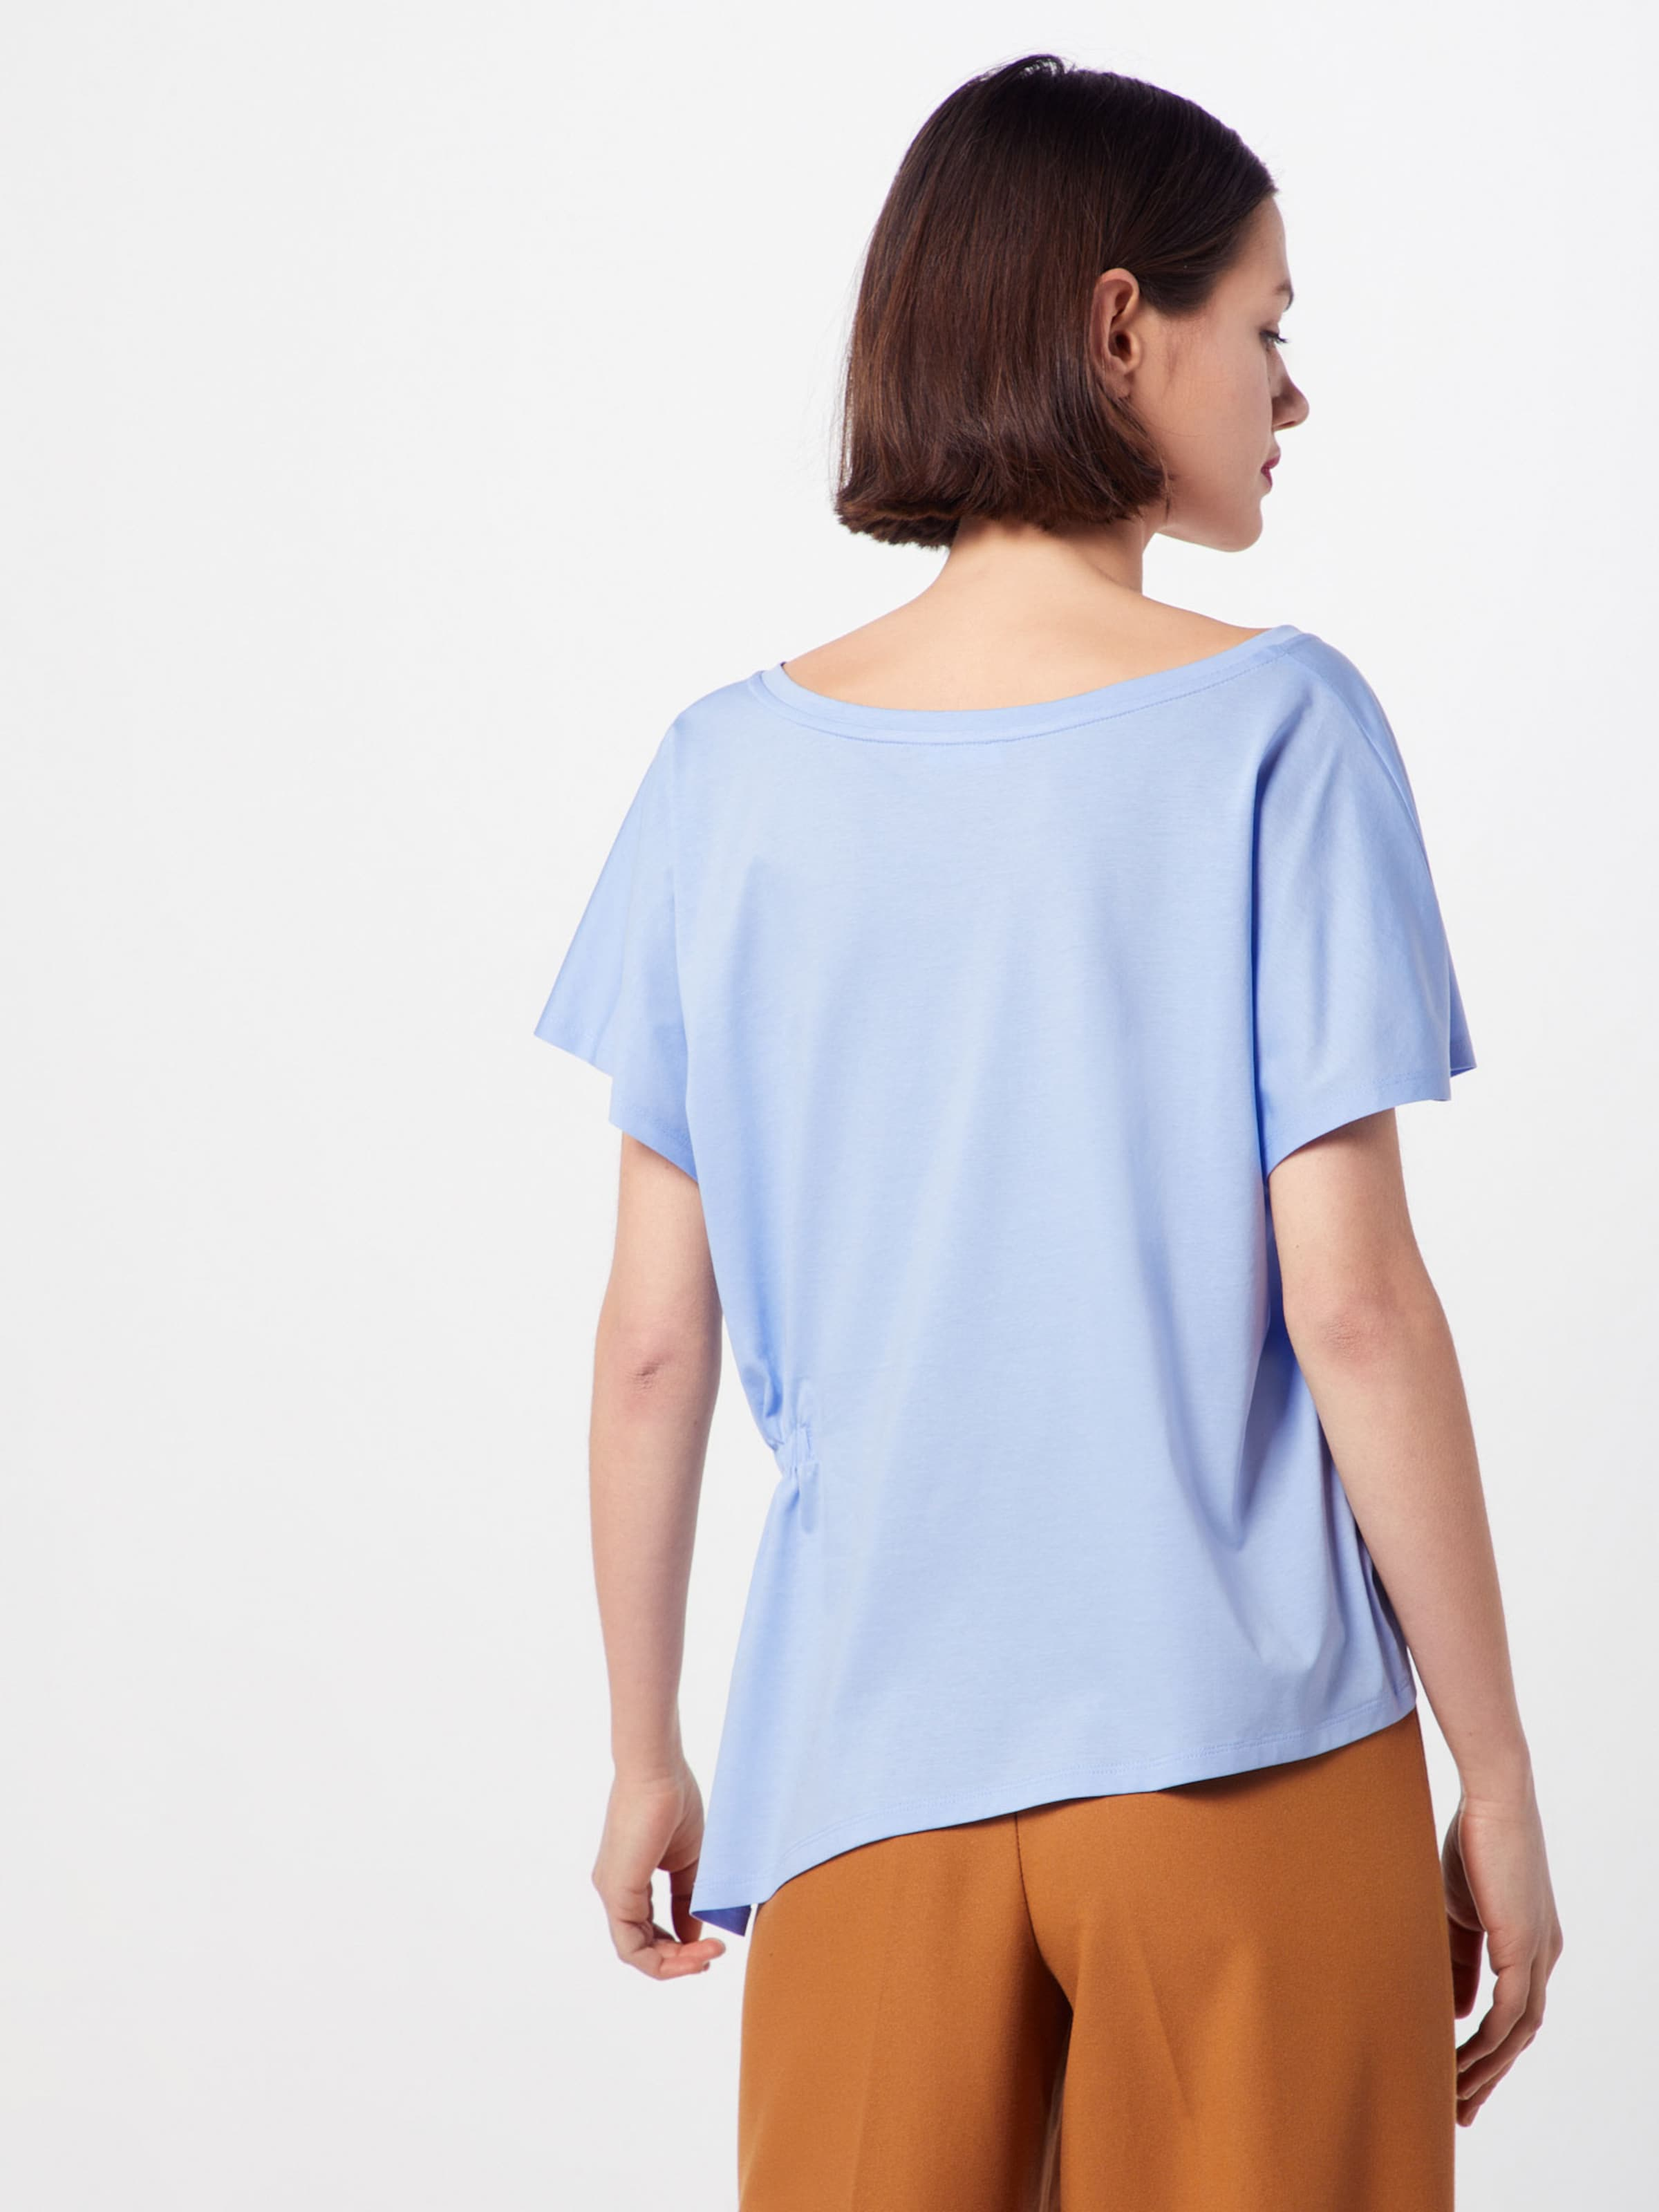 'maali' 'maali' Drykorn Drykorn Drykorn Shirt Blau In Shirt In Blau JcFl1TK